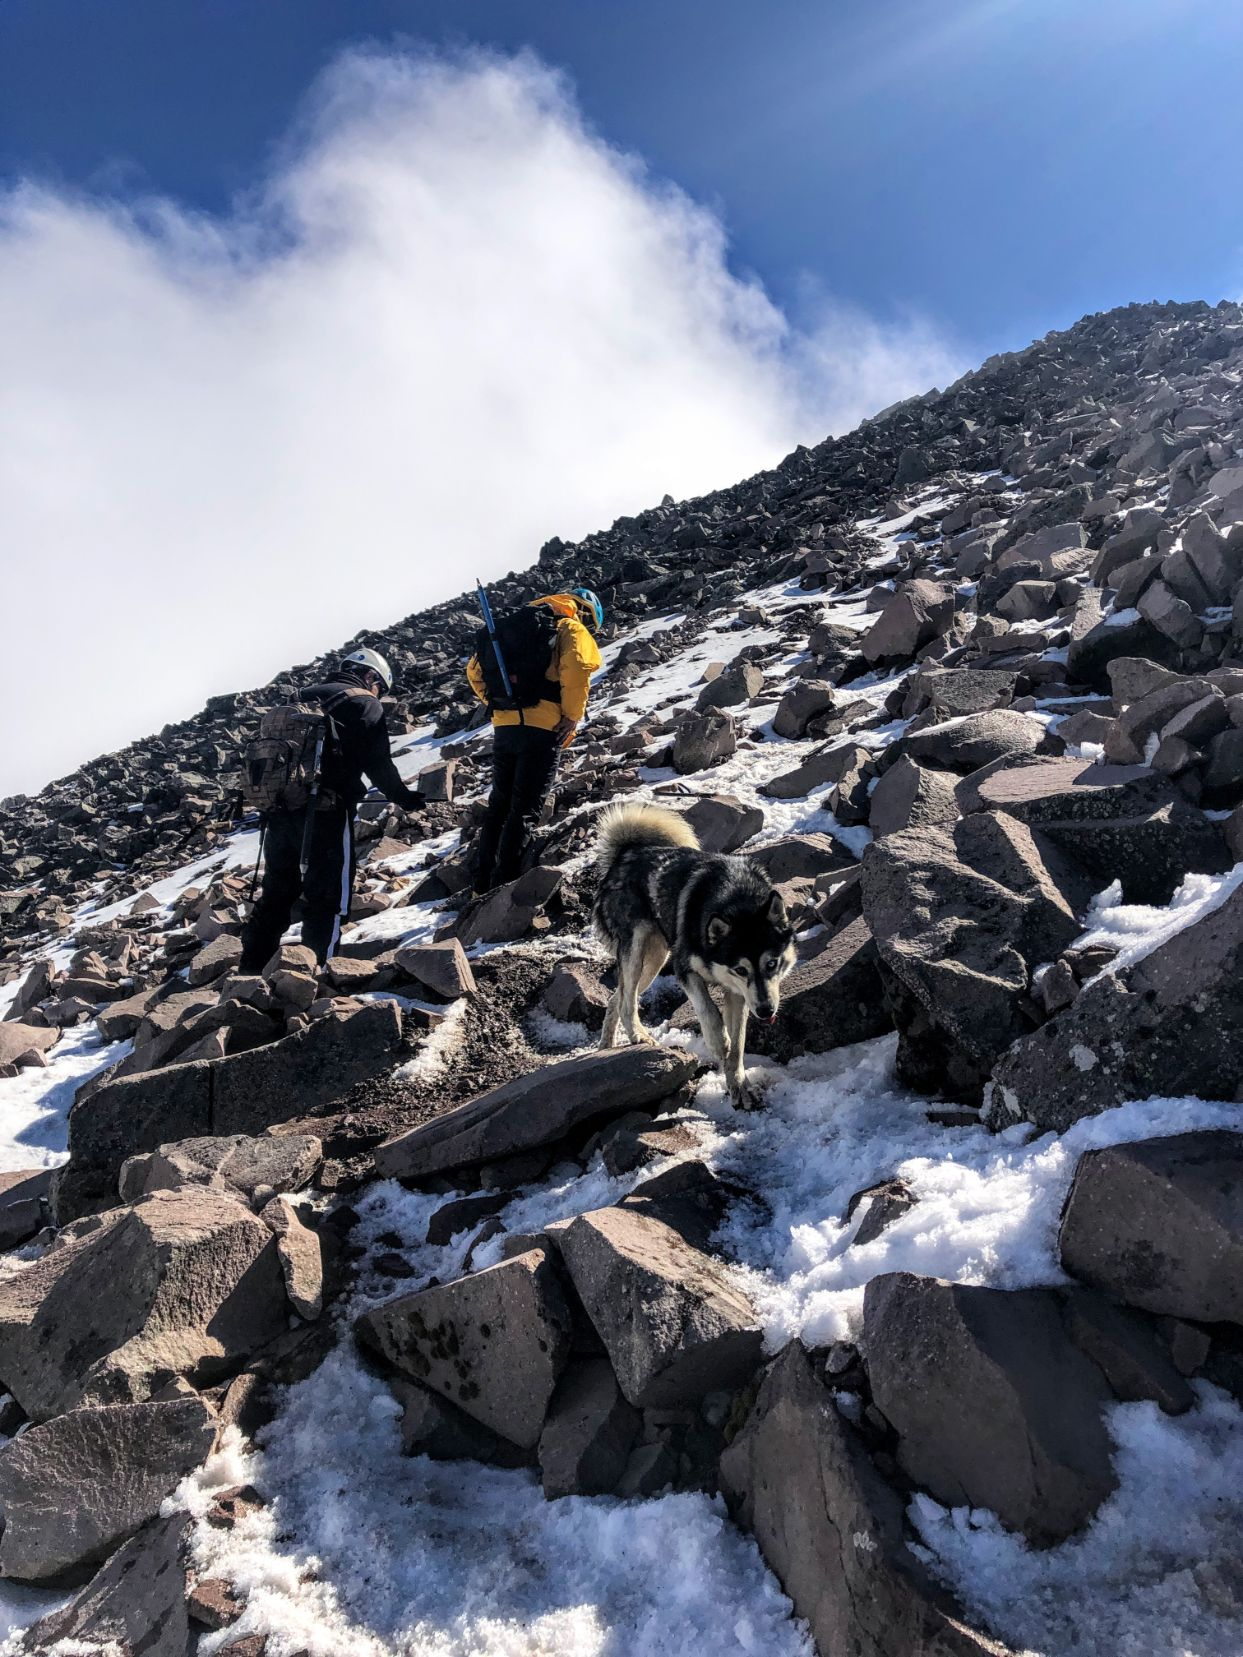 rock scramble at the top of Malinche Volcano